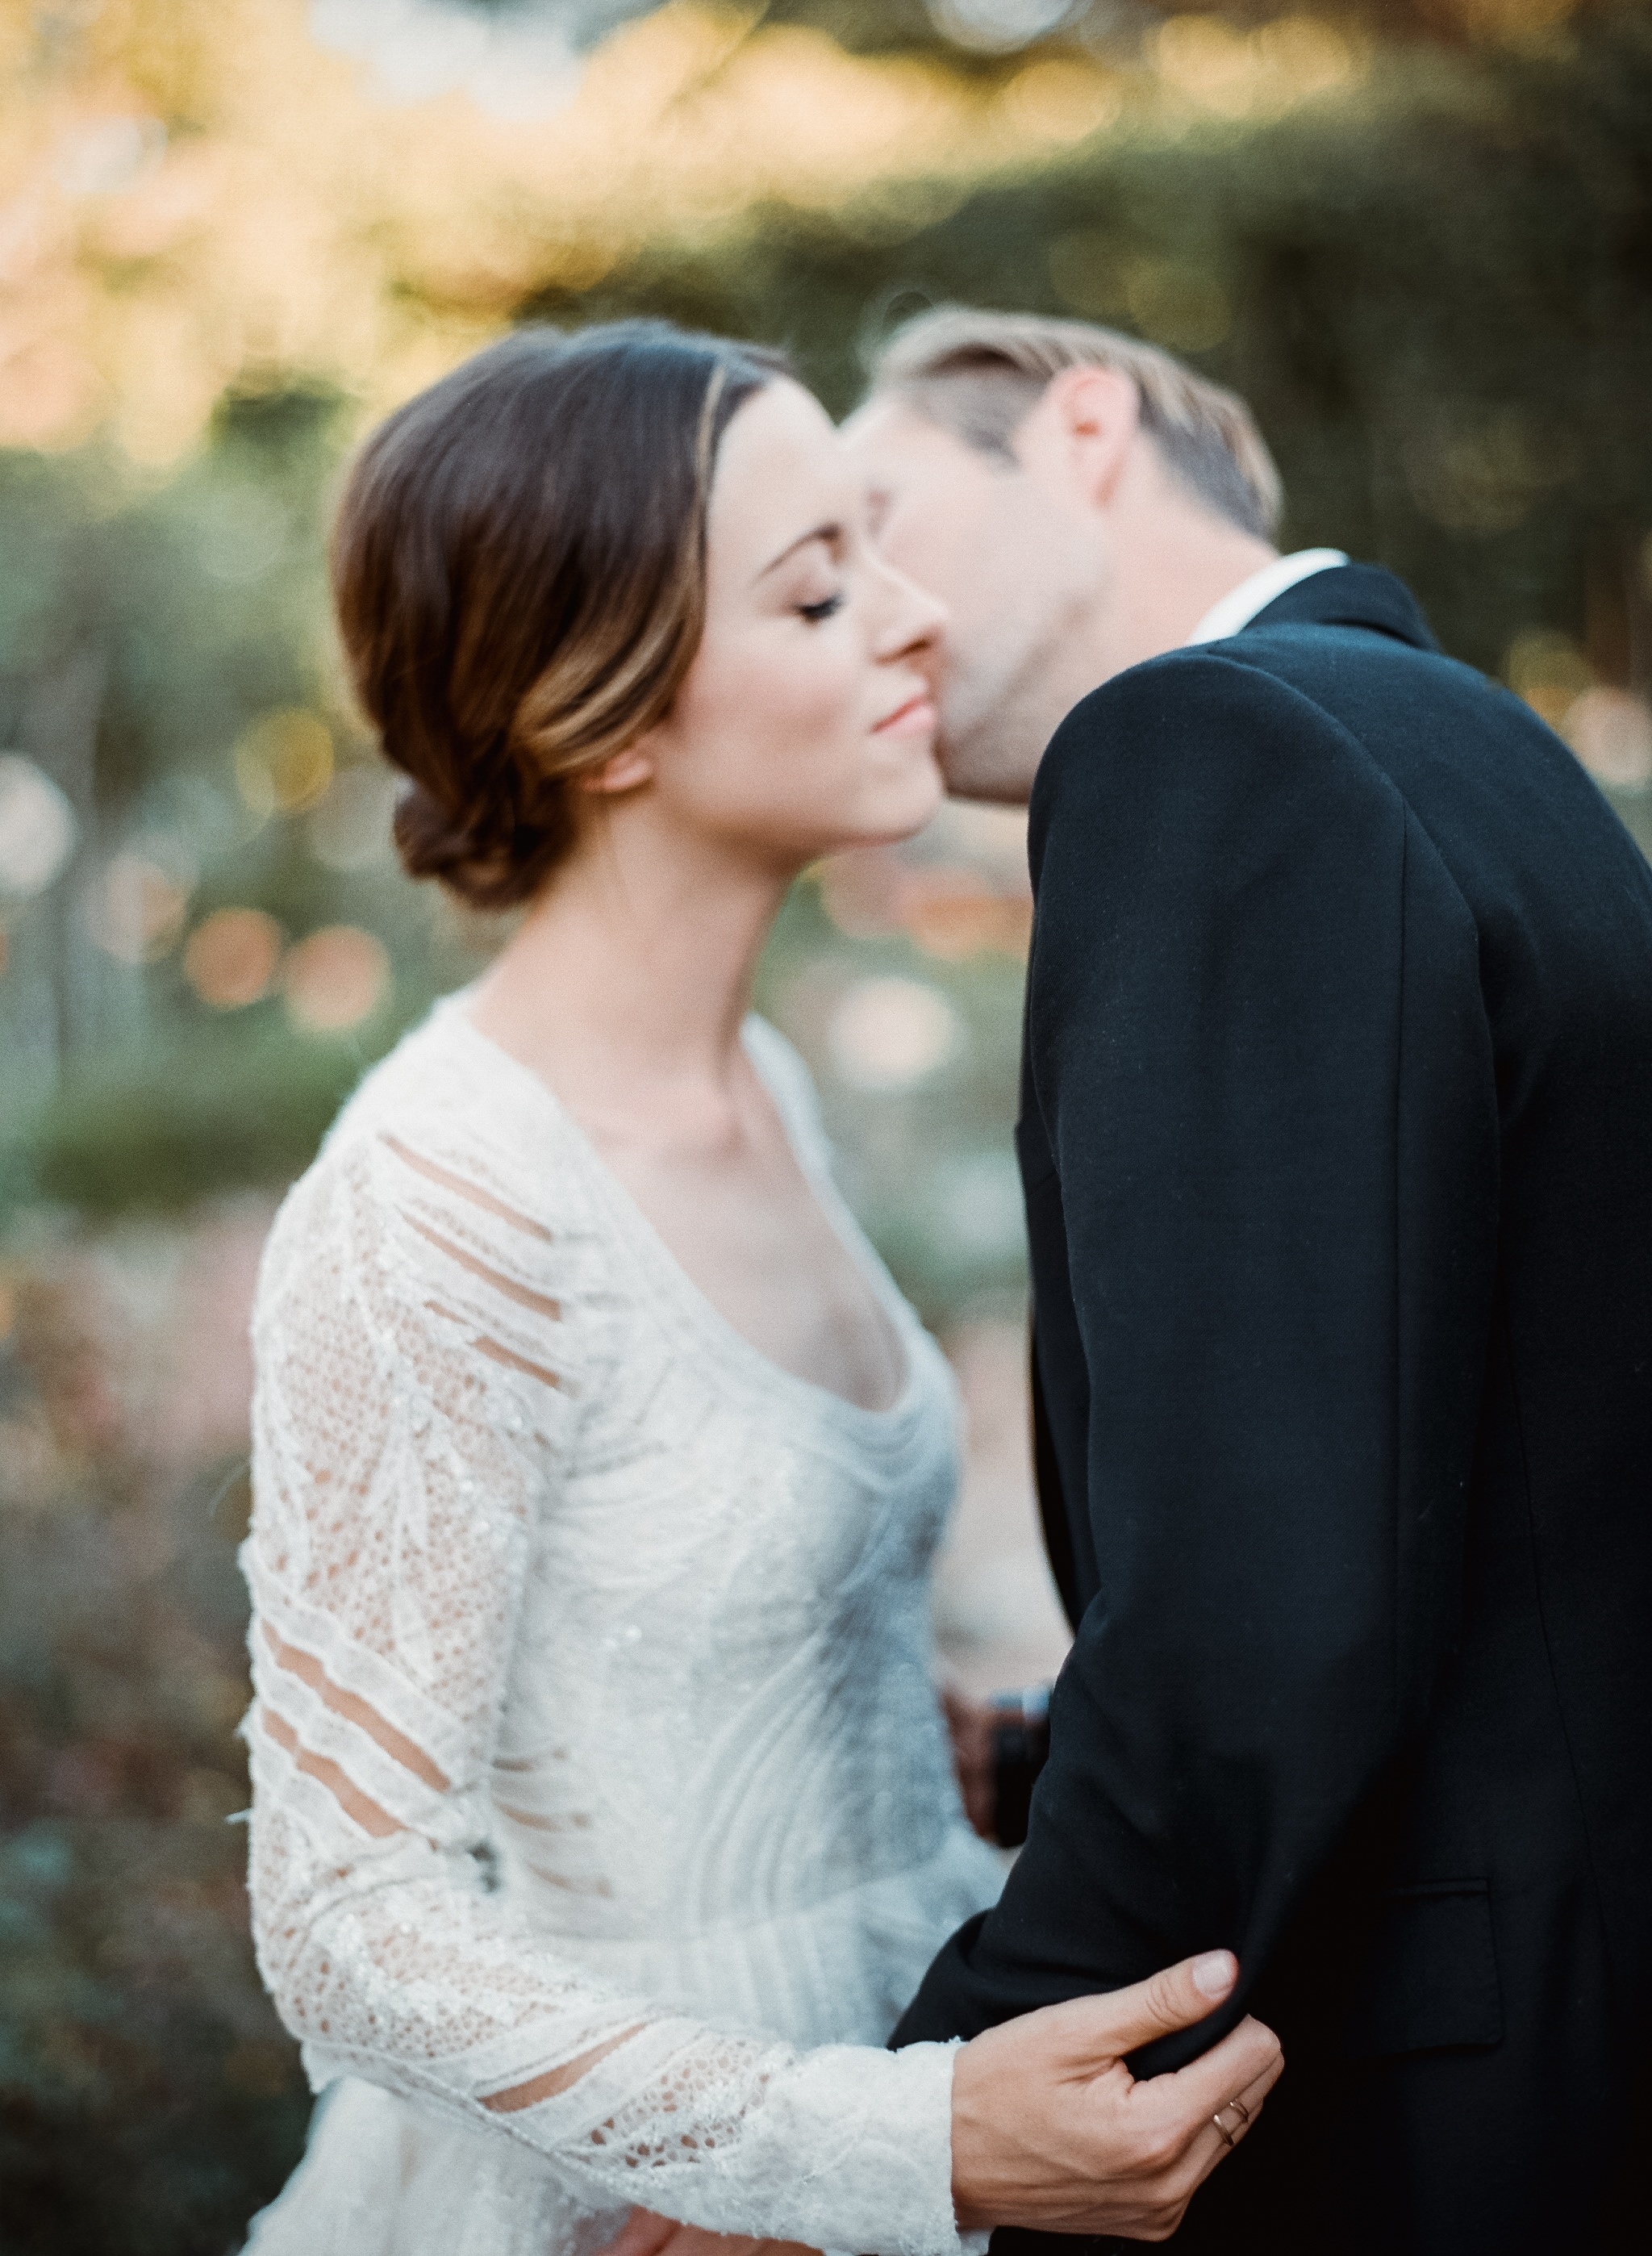 dottie morris_fine art film wedding photography-1-2.jpg